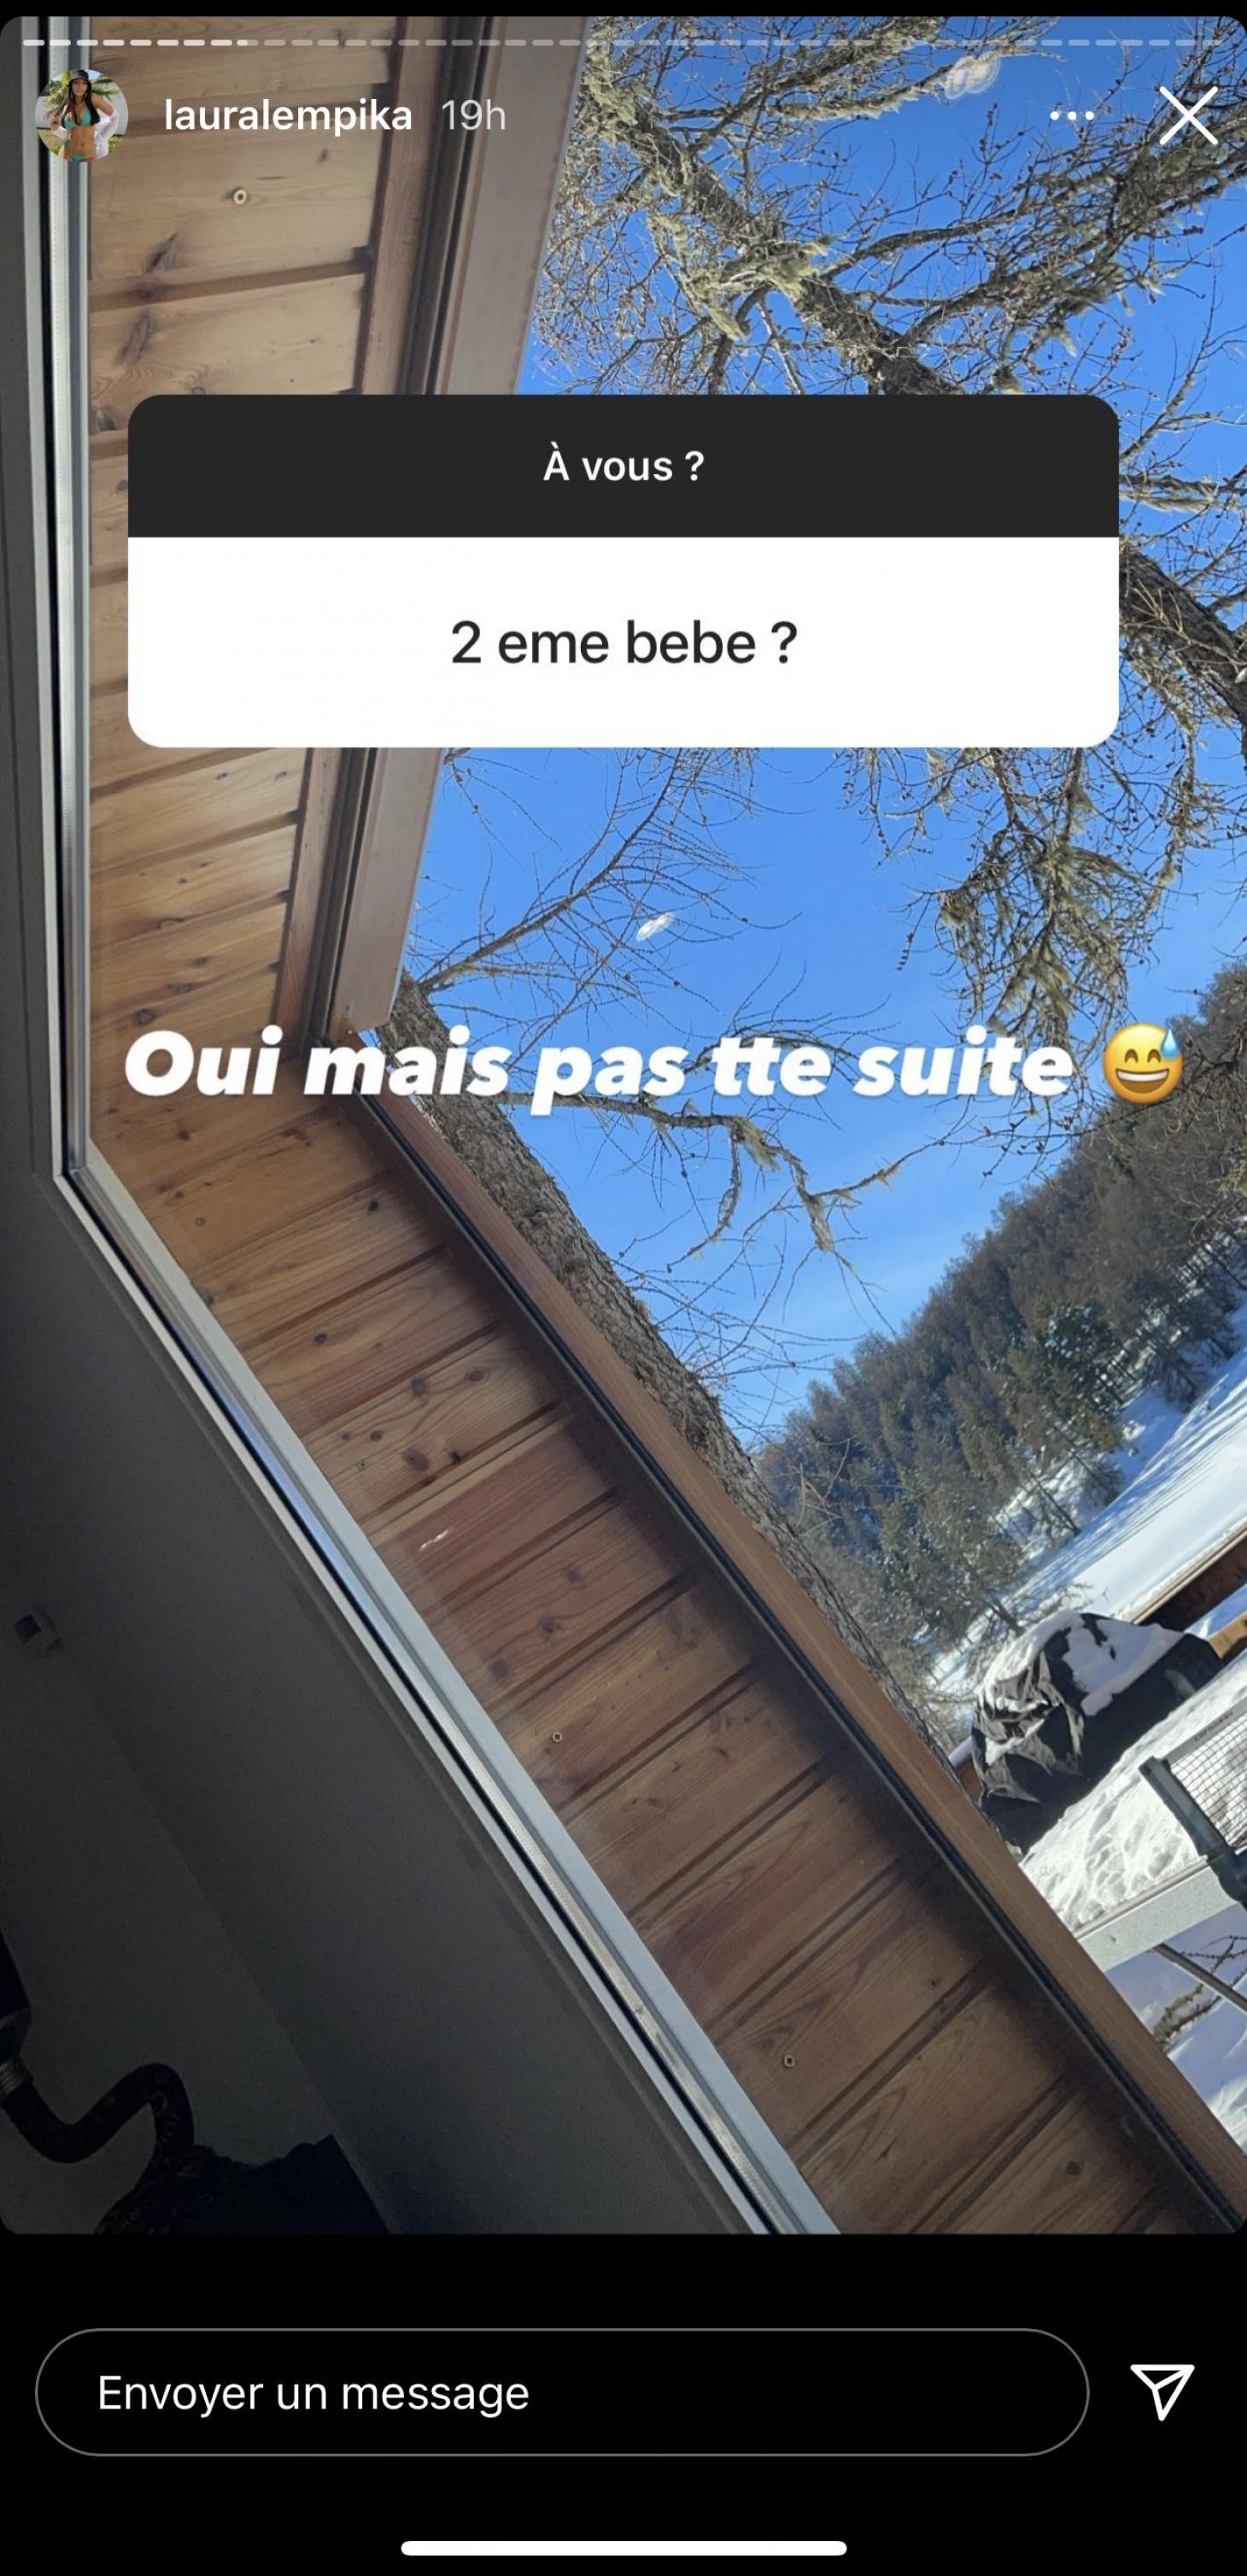 @ Instagram